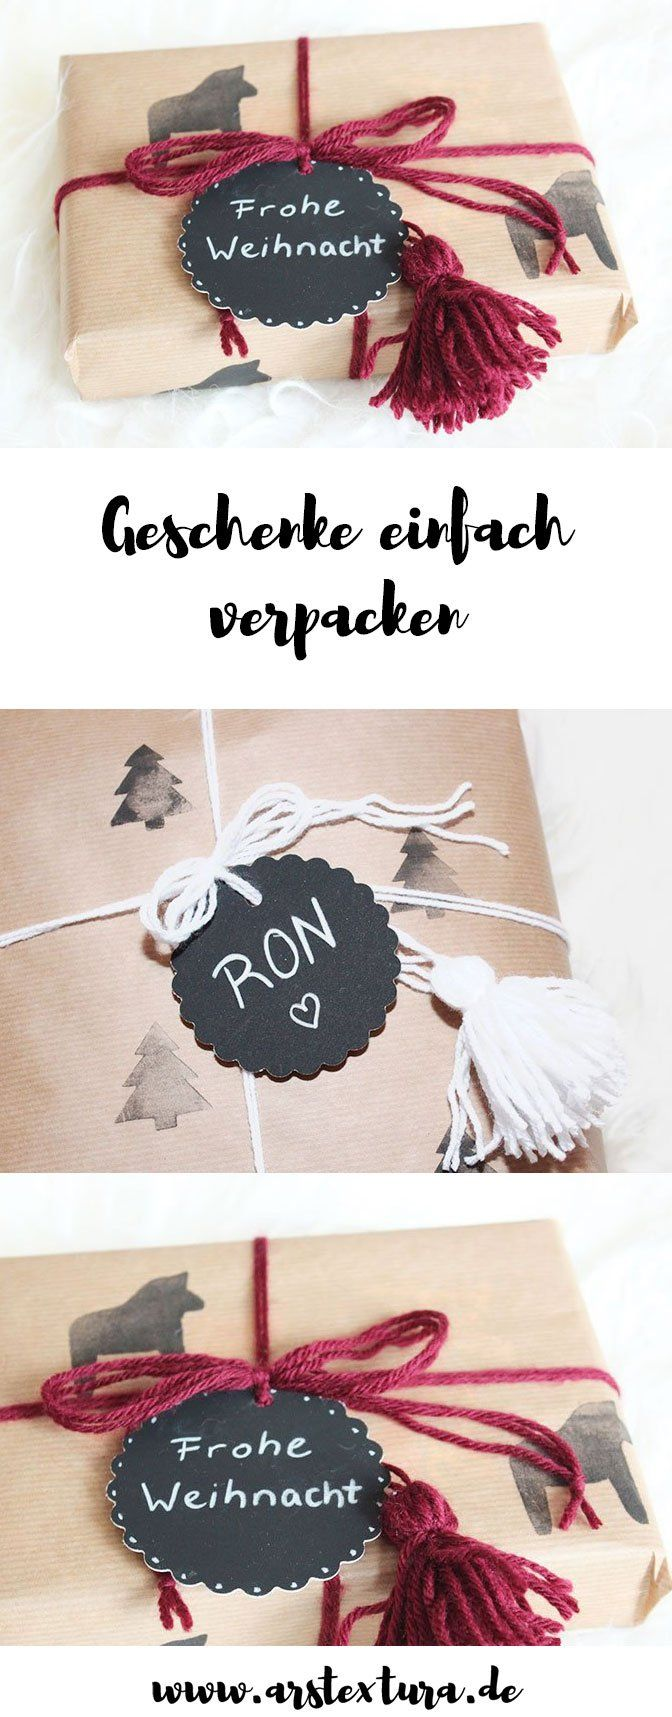 DIY Anleitung: Geschenke kreativ verpacken mit Packpapier